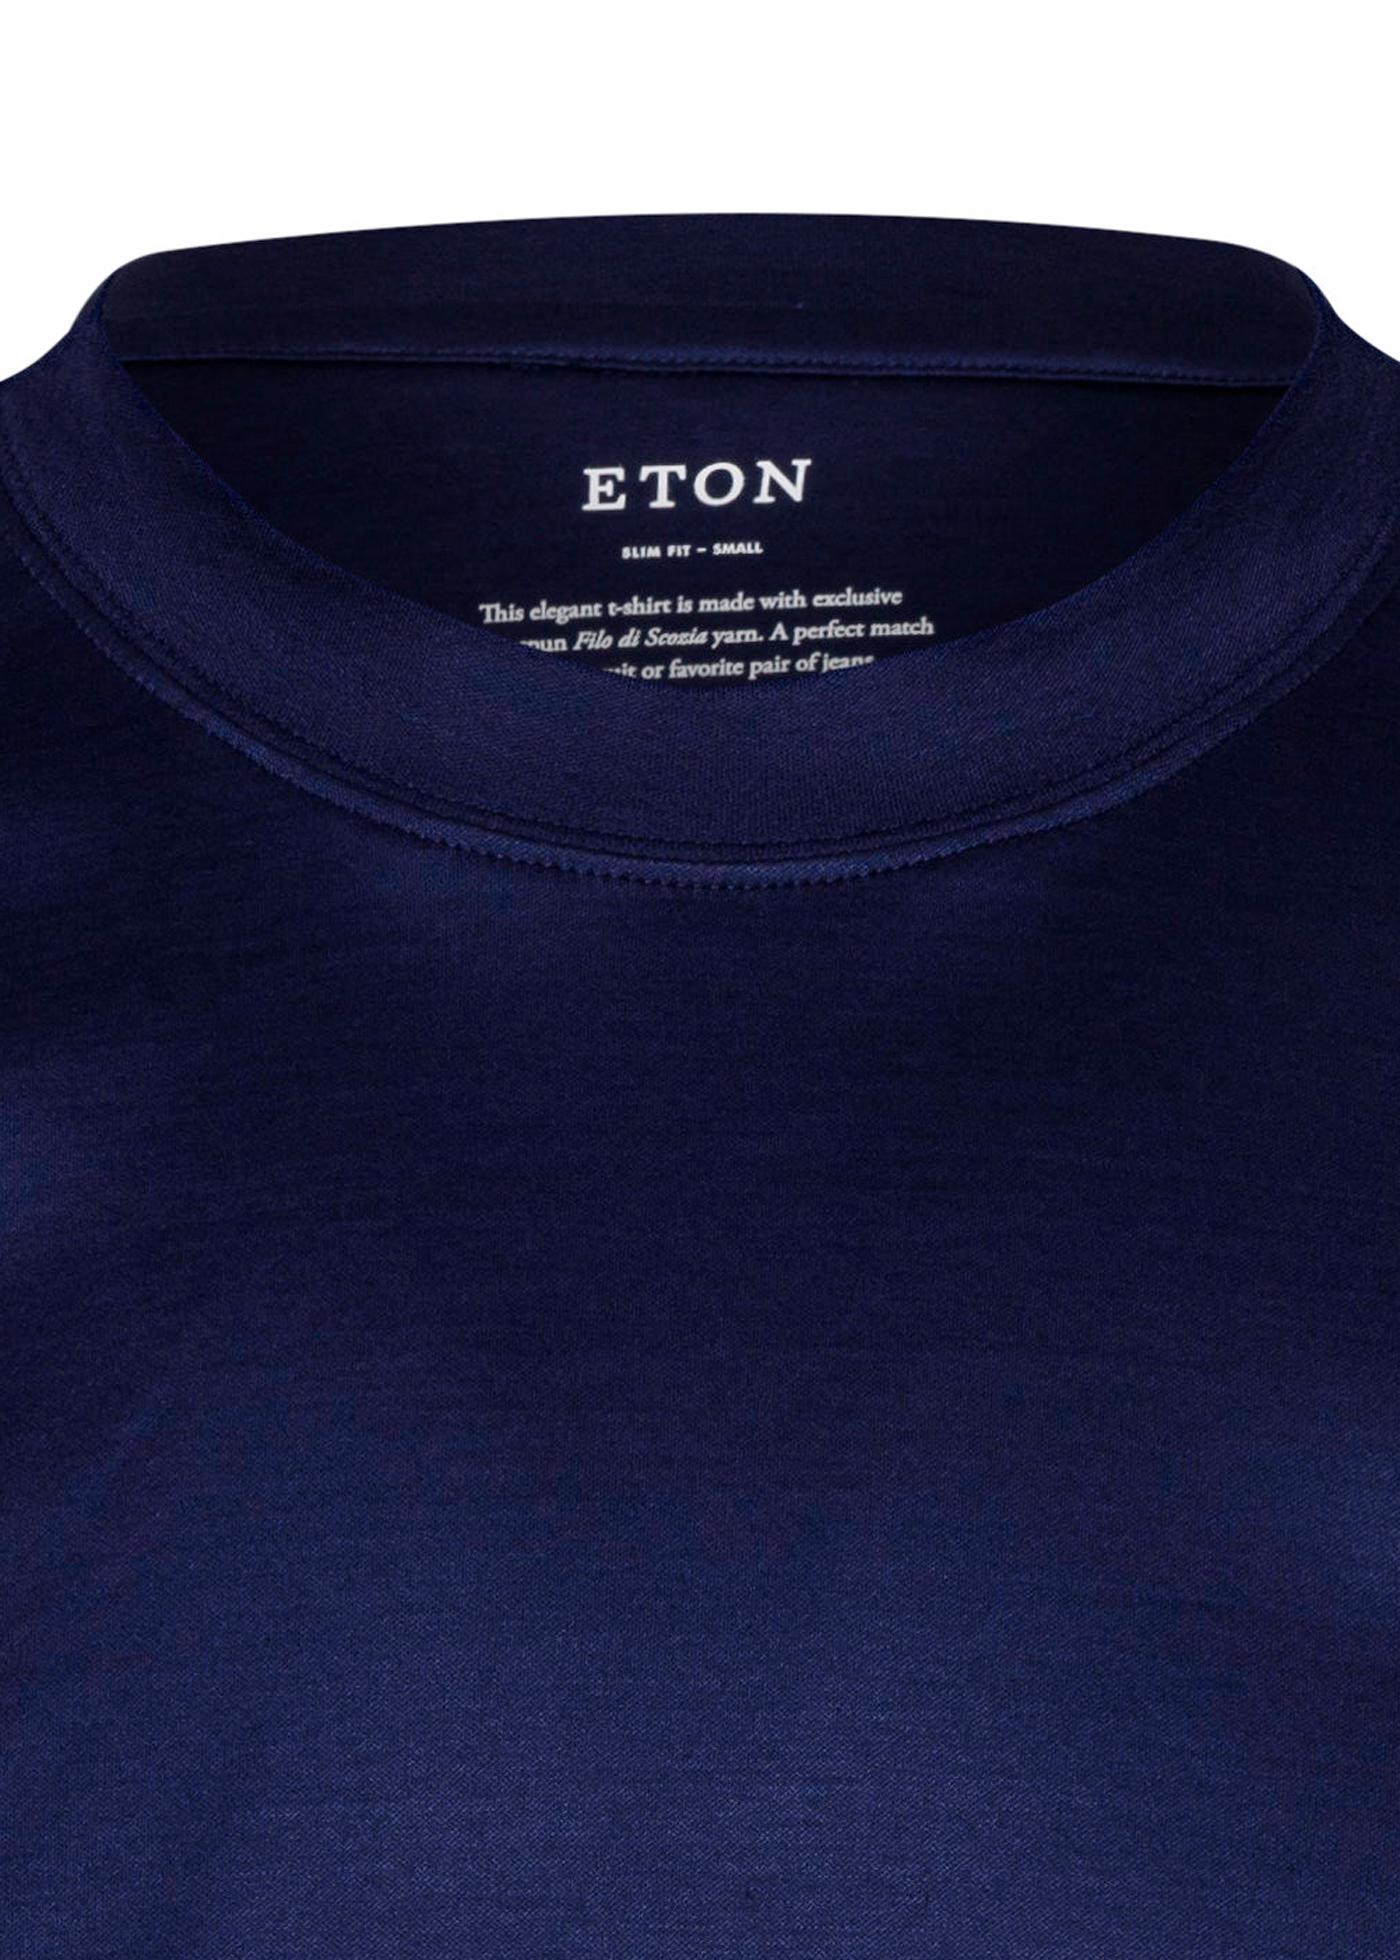 1000023562609 Men shirt: Casual / Jersey image number 2